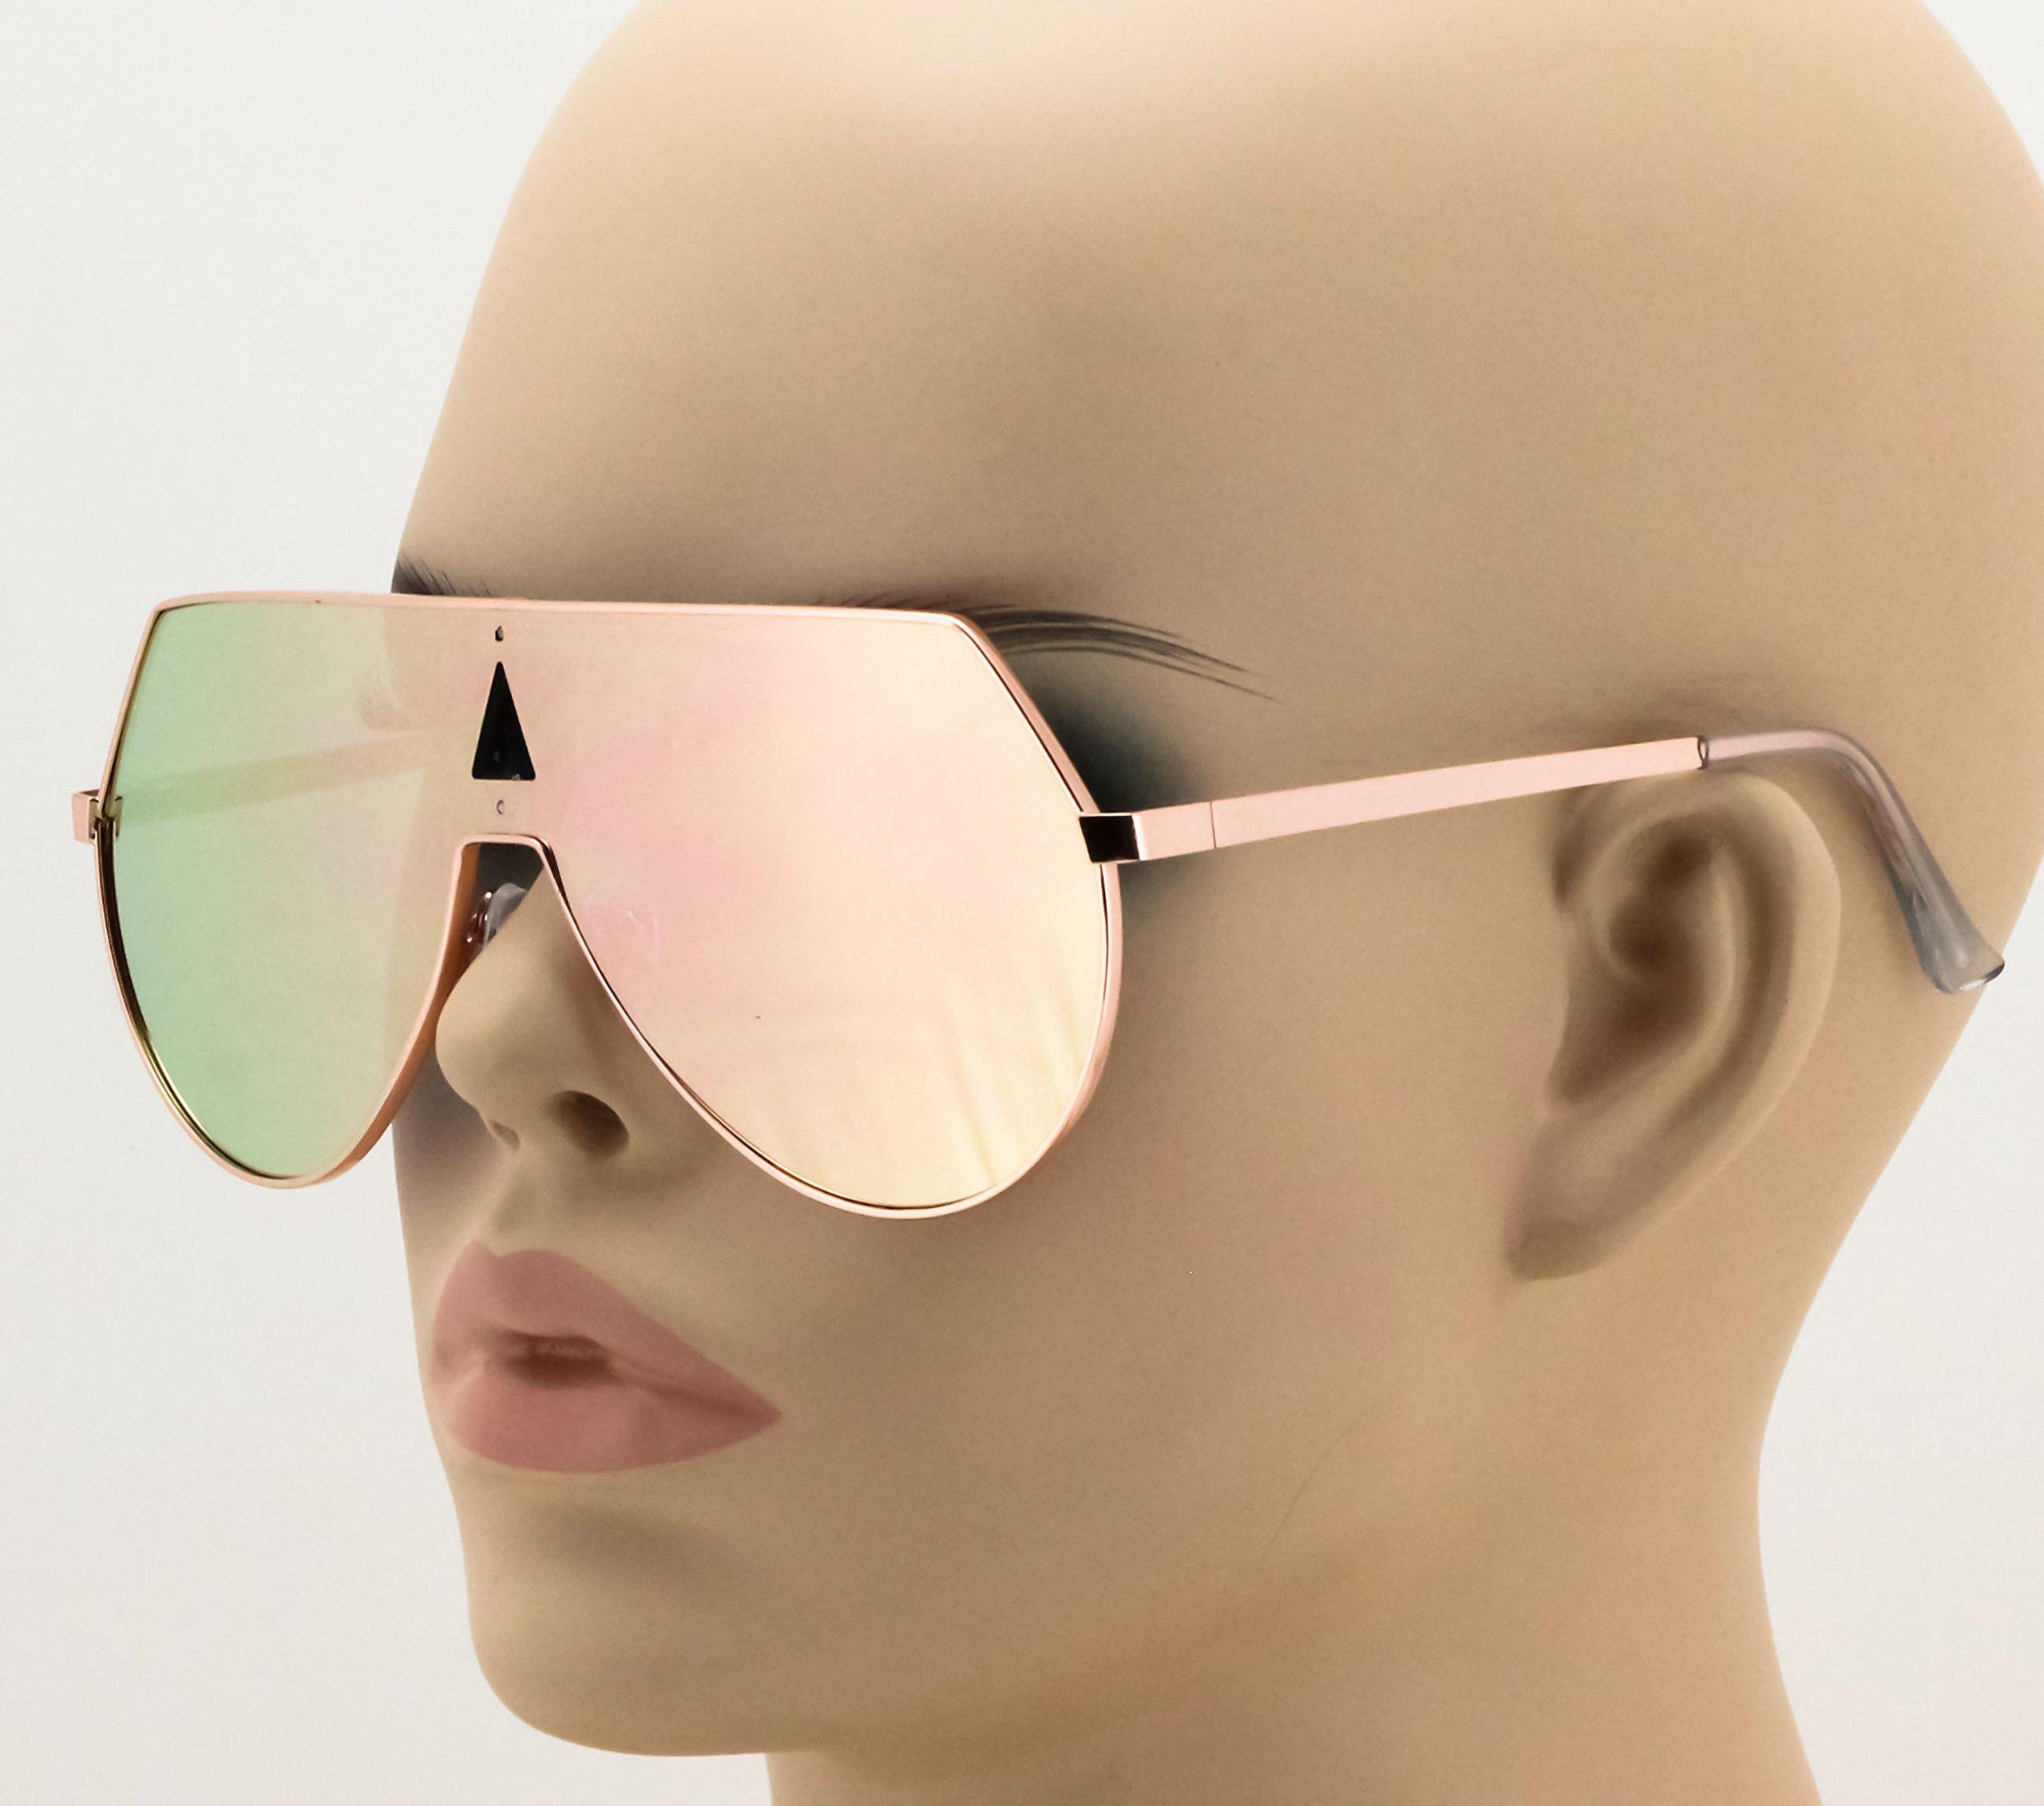 Elite Oversize Unisex Flat Top Aviator Retro Shield Mirrored Lens Rimless Sunglasses (Rose Pink Mirror, 5.8) by EliteGlasses (Image #2)